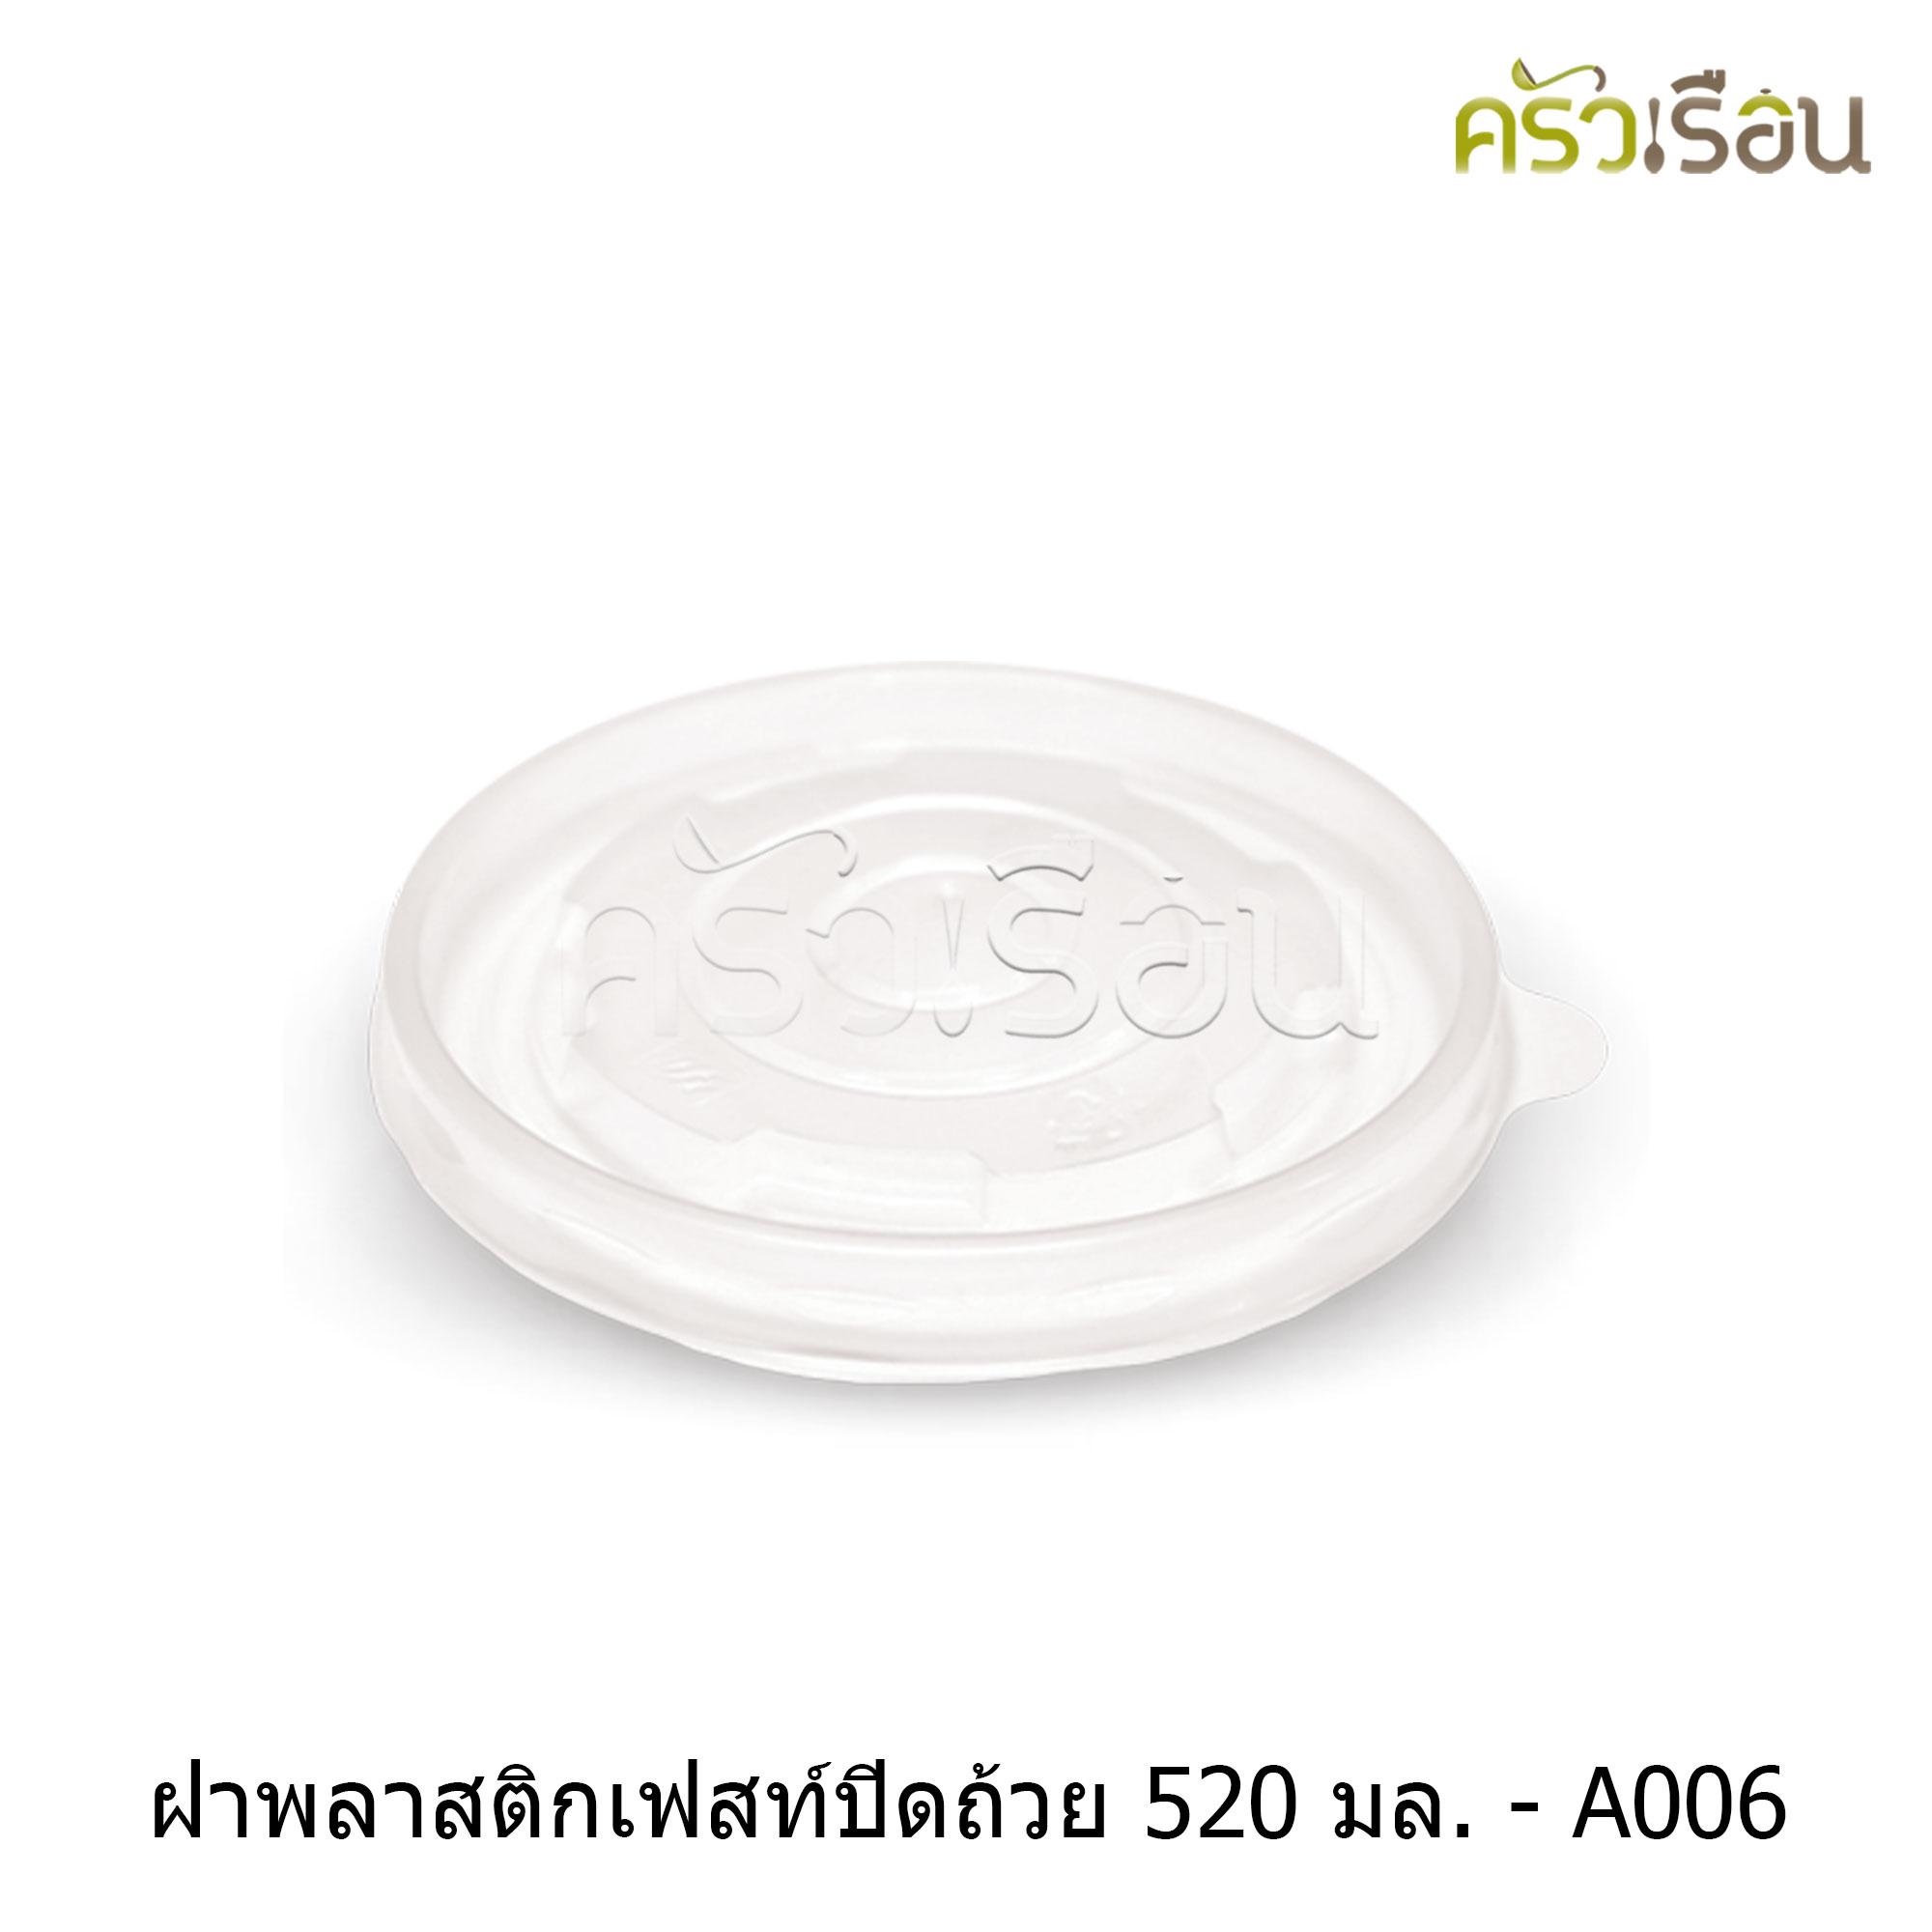 Fest เฟสท์ - ฝาพลาสติกสำหรับถ้วยเฟสท์ 520 มล. 50 ใบ - A006